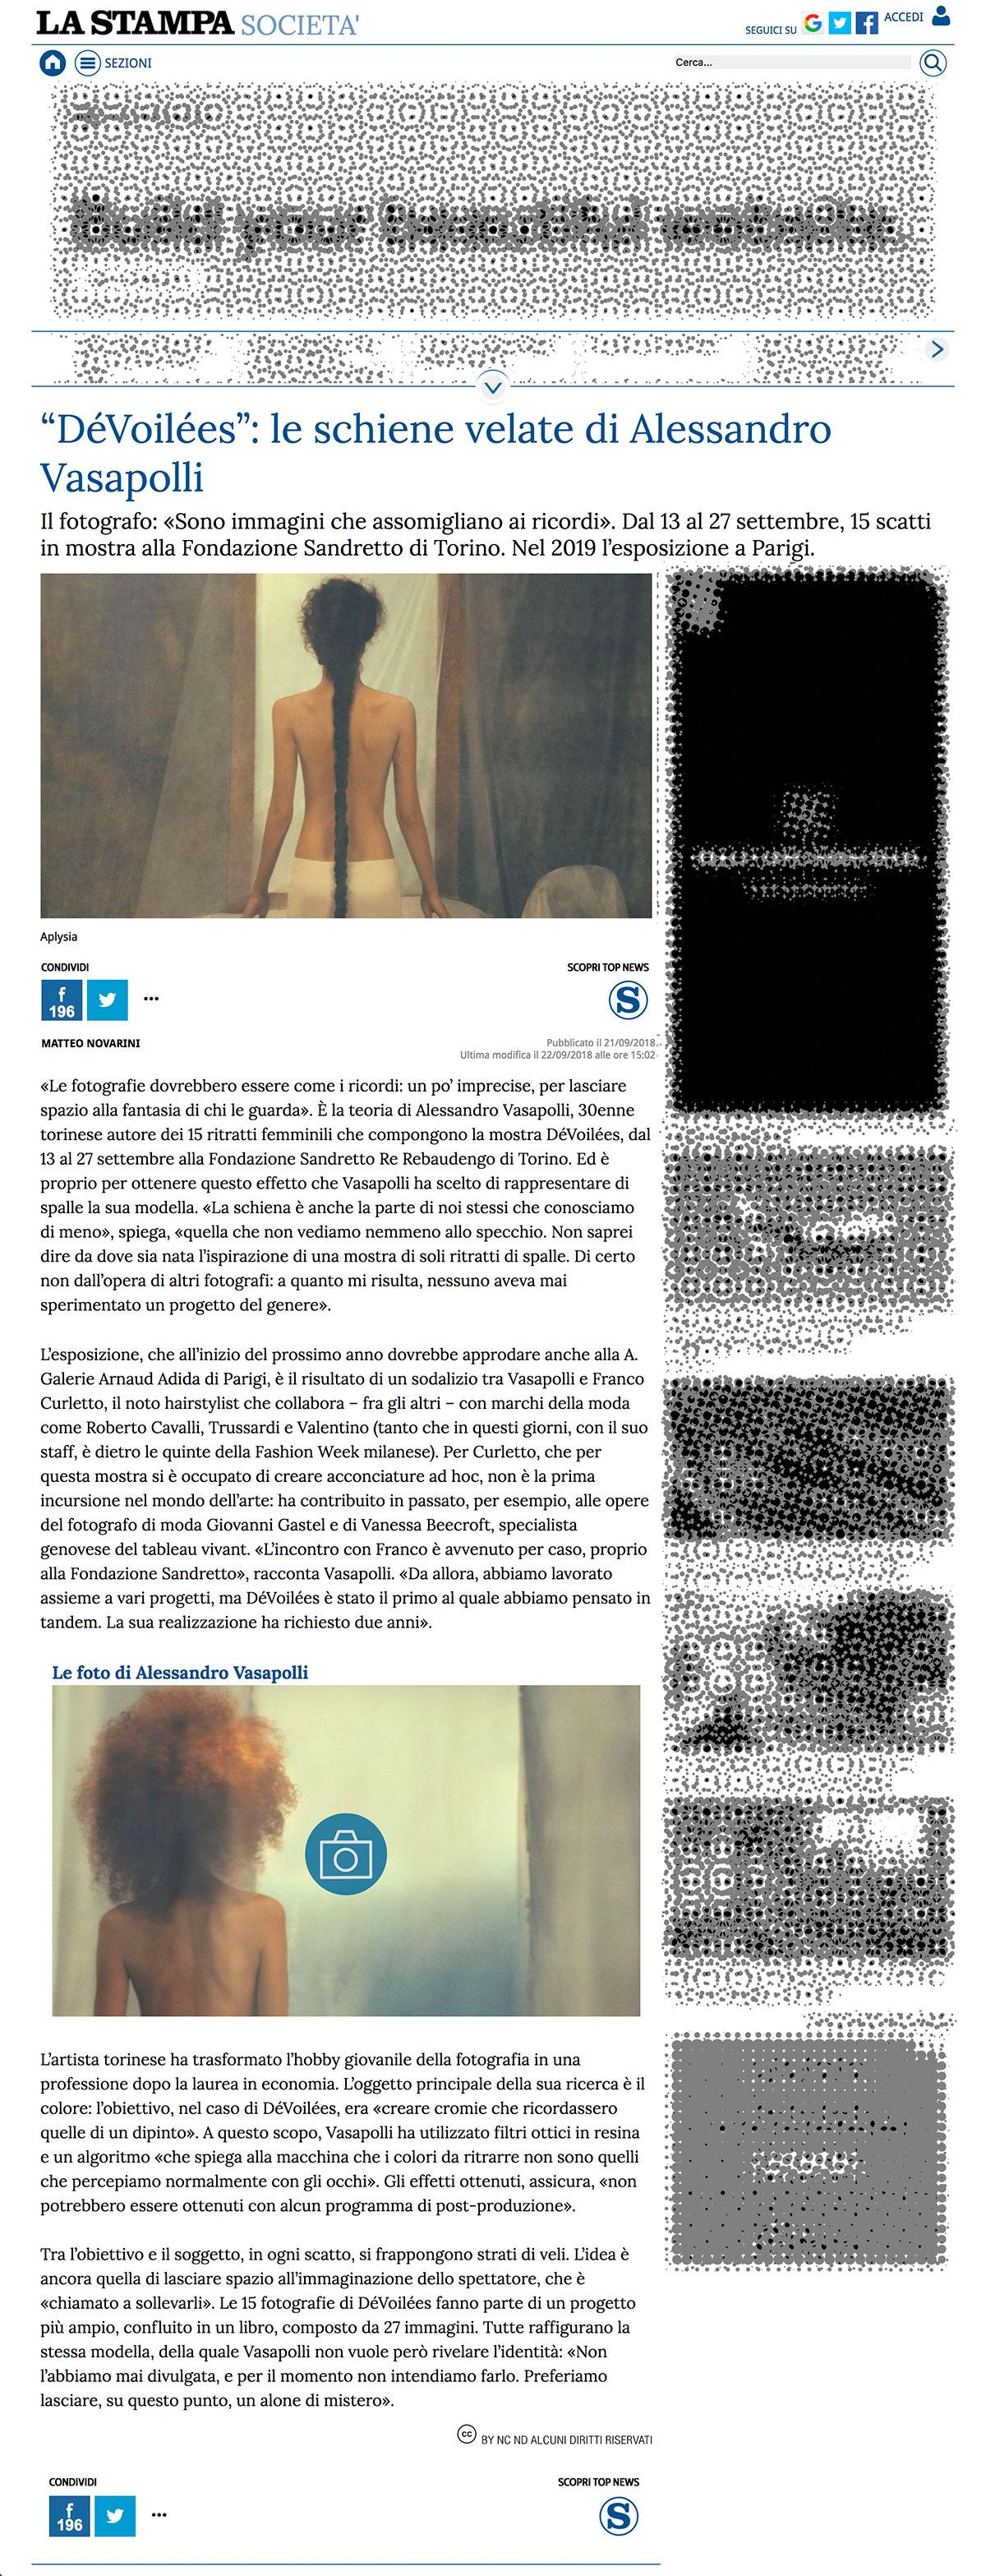 Alessandro_Vasapolli_DeVoilees_La_Stampa_Digital